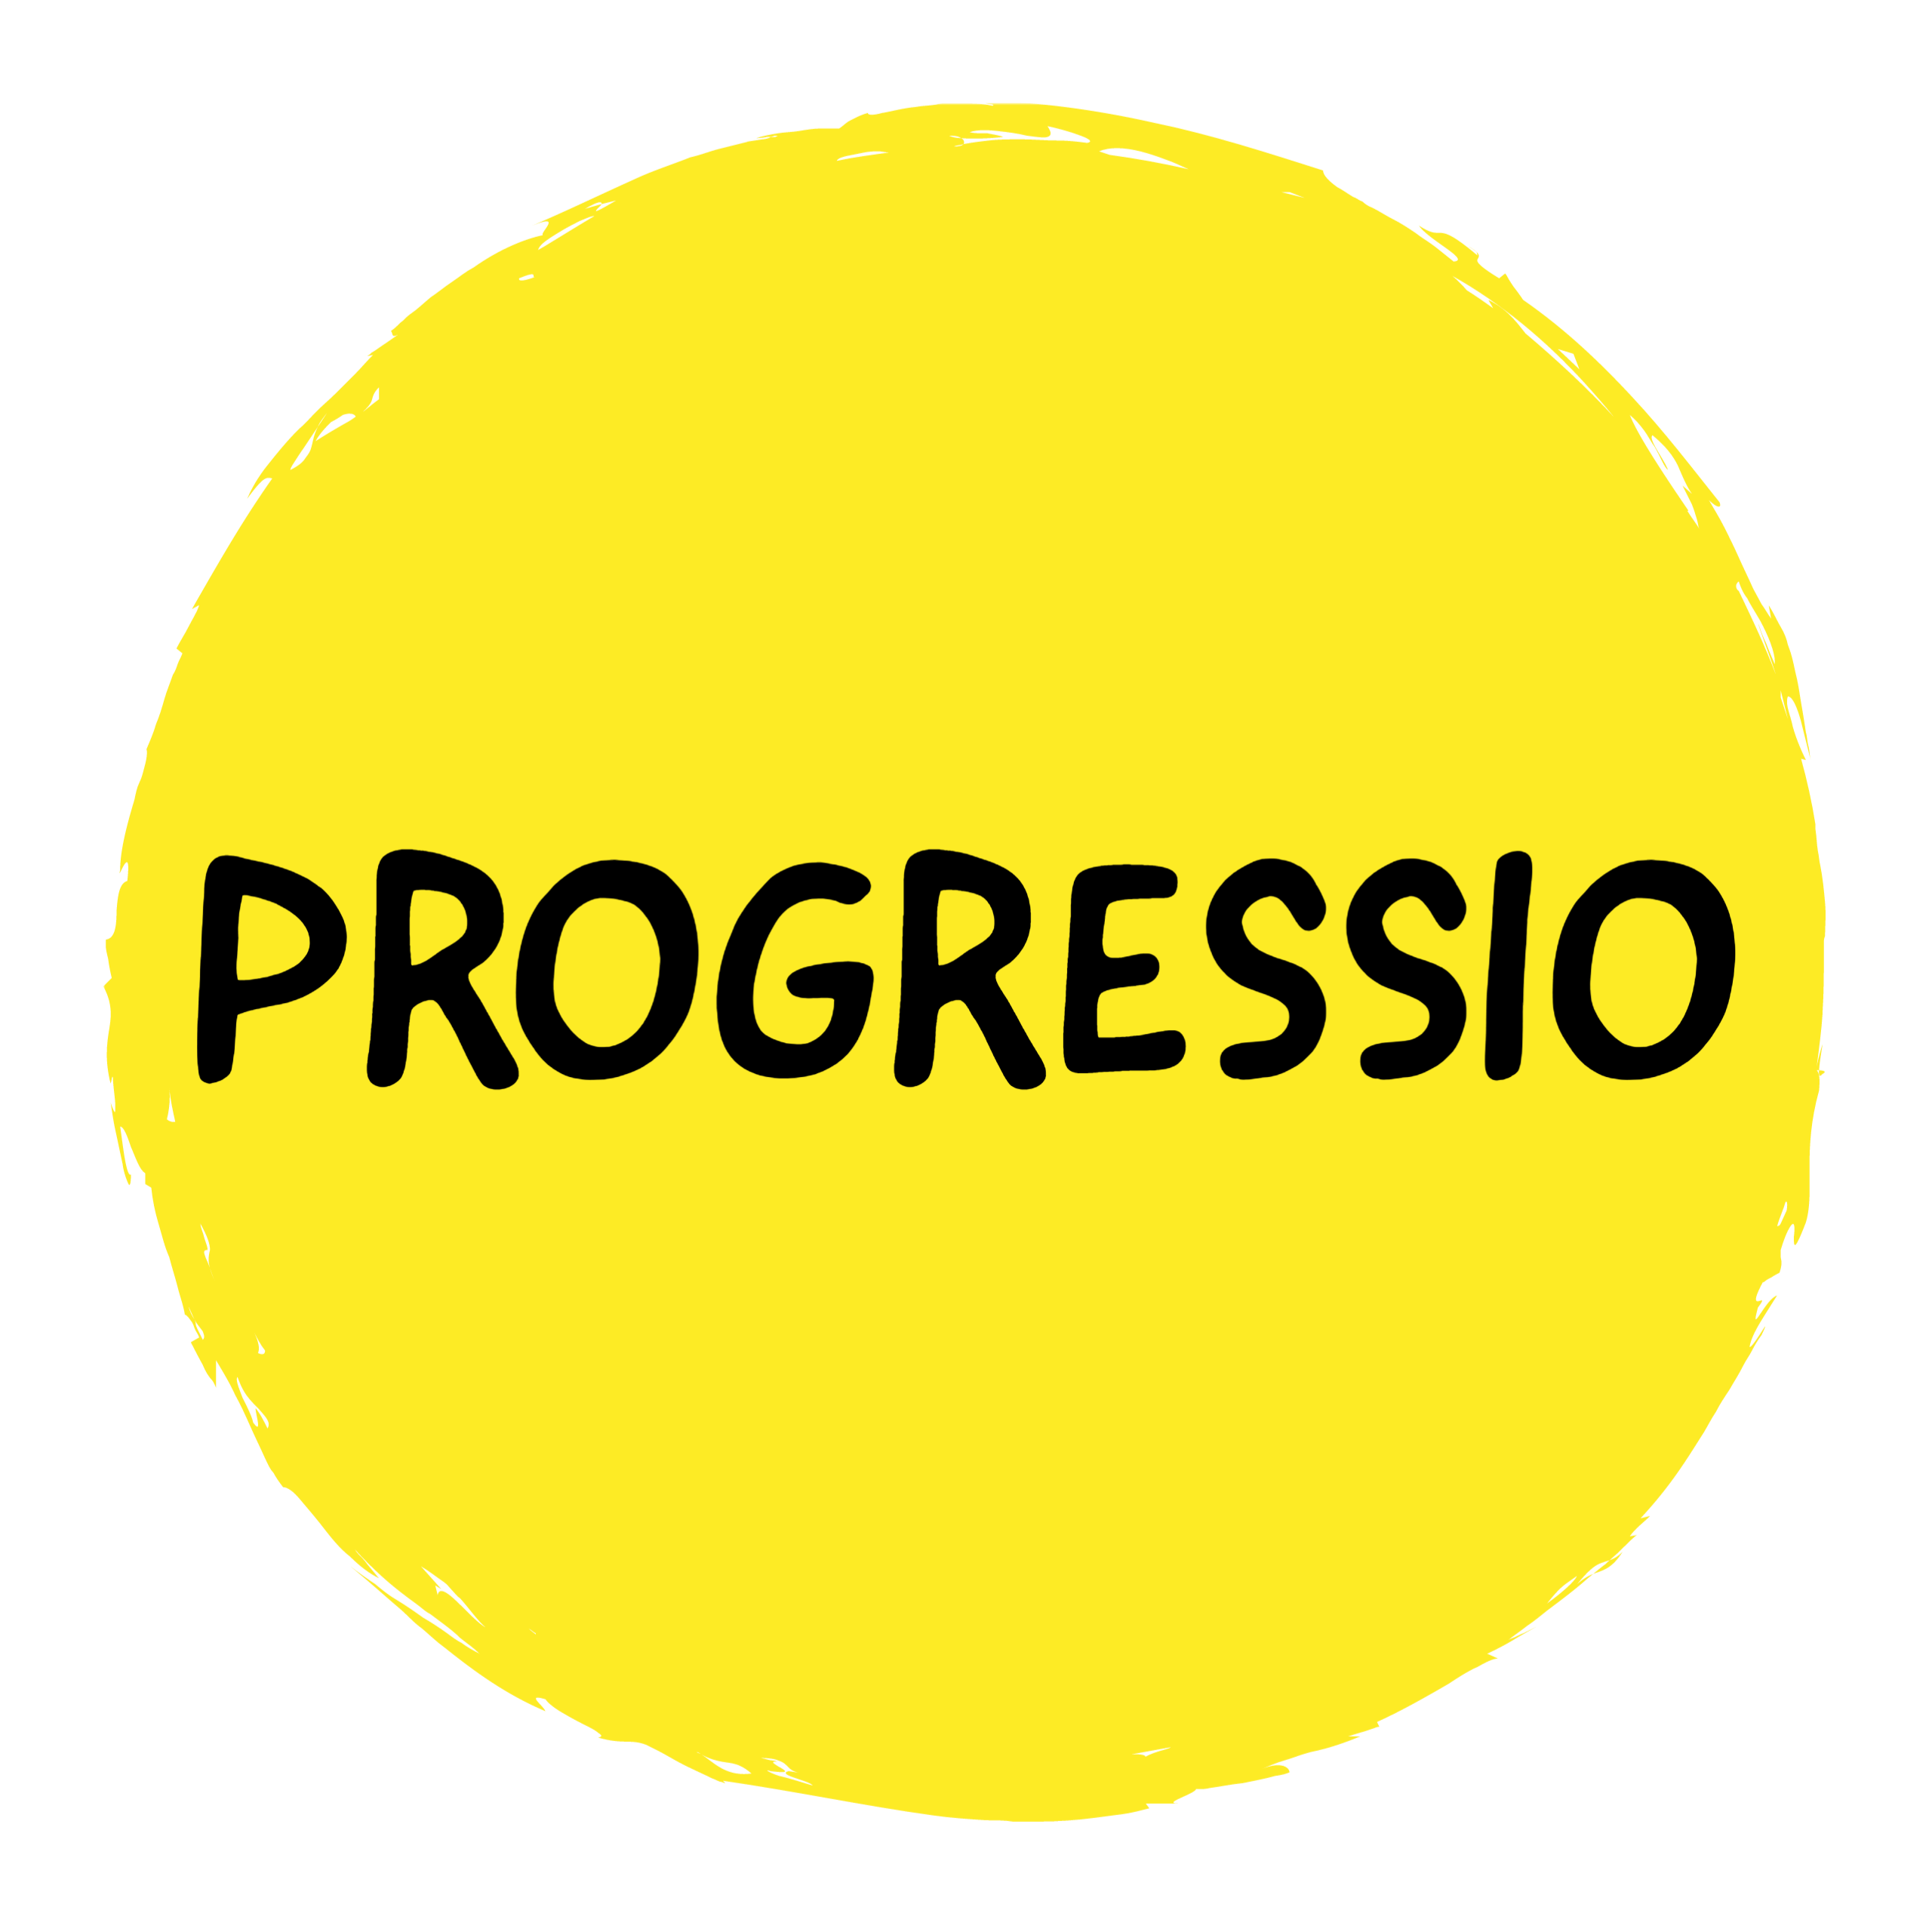 Progressio